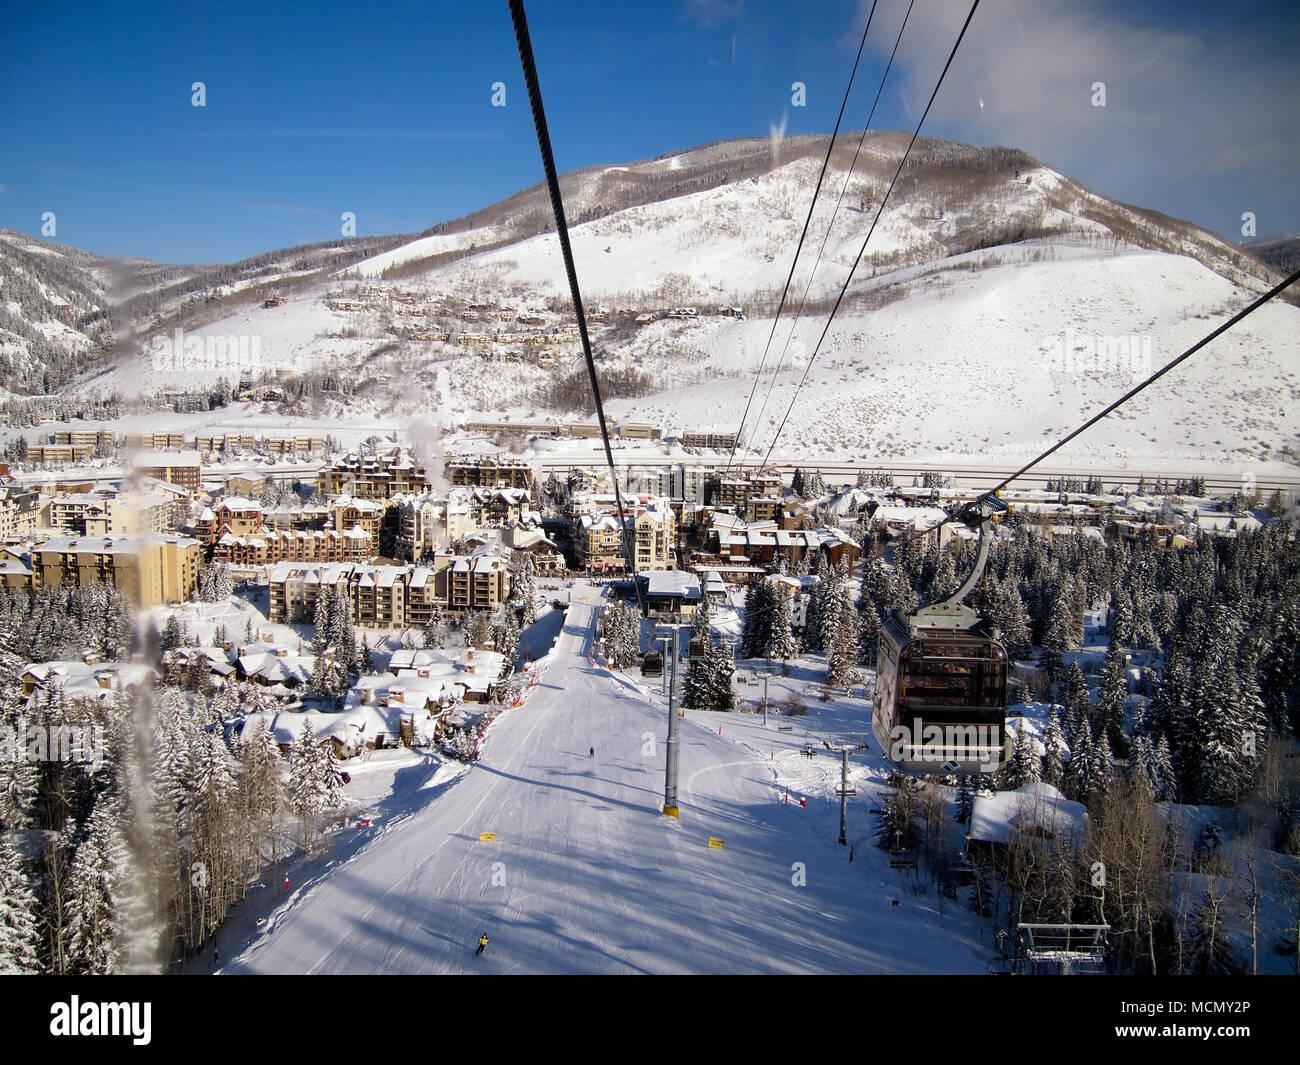 Vail, Colorado; ski resort Banque D'Images